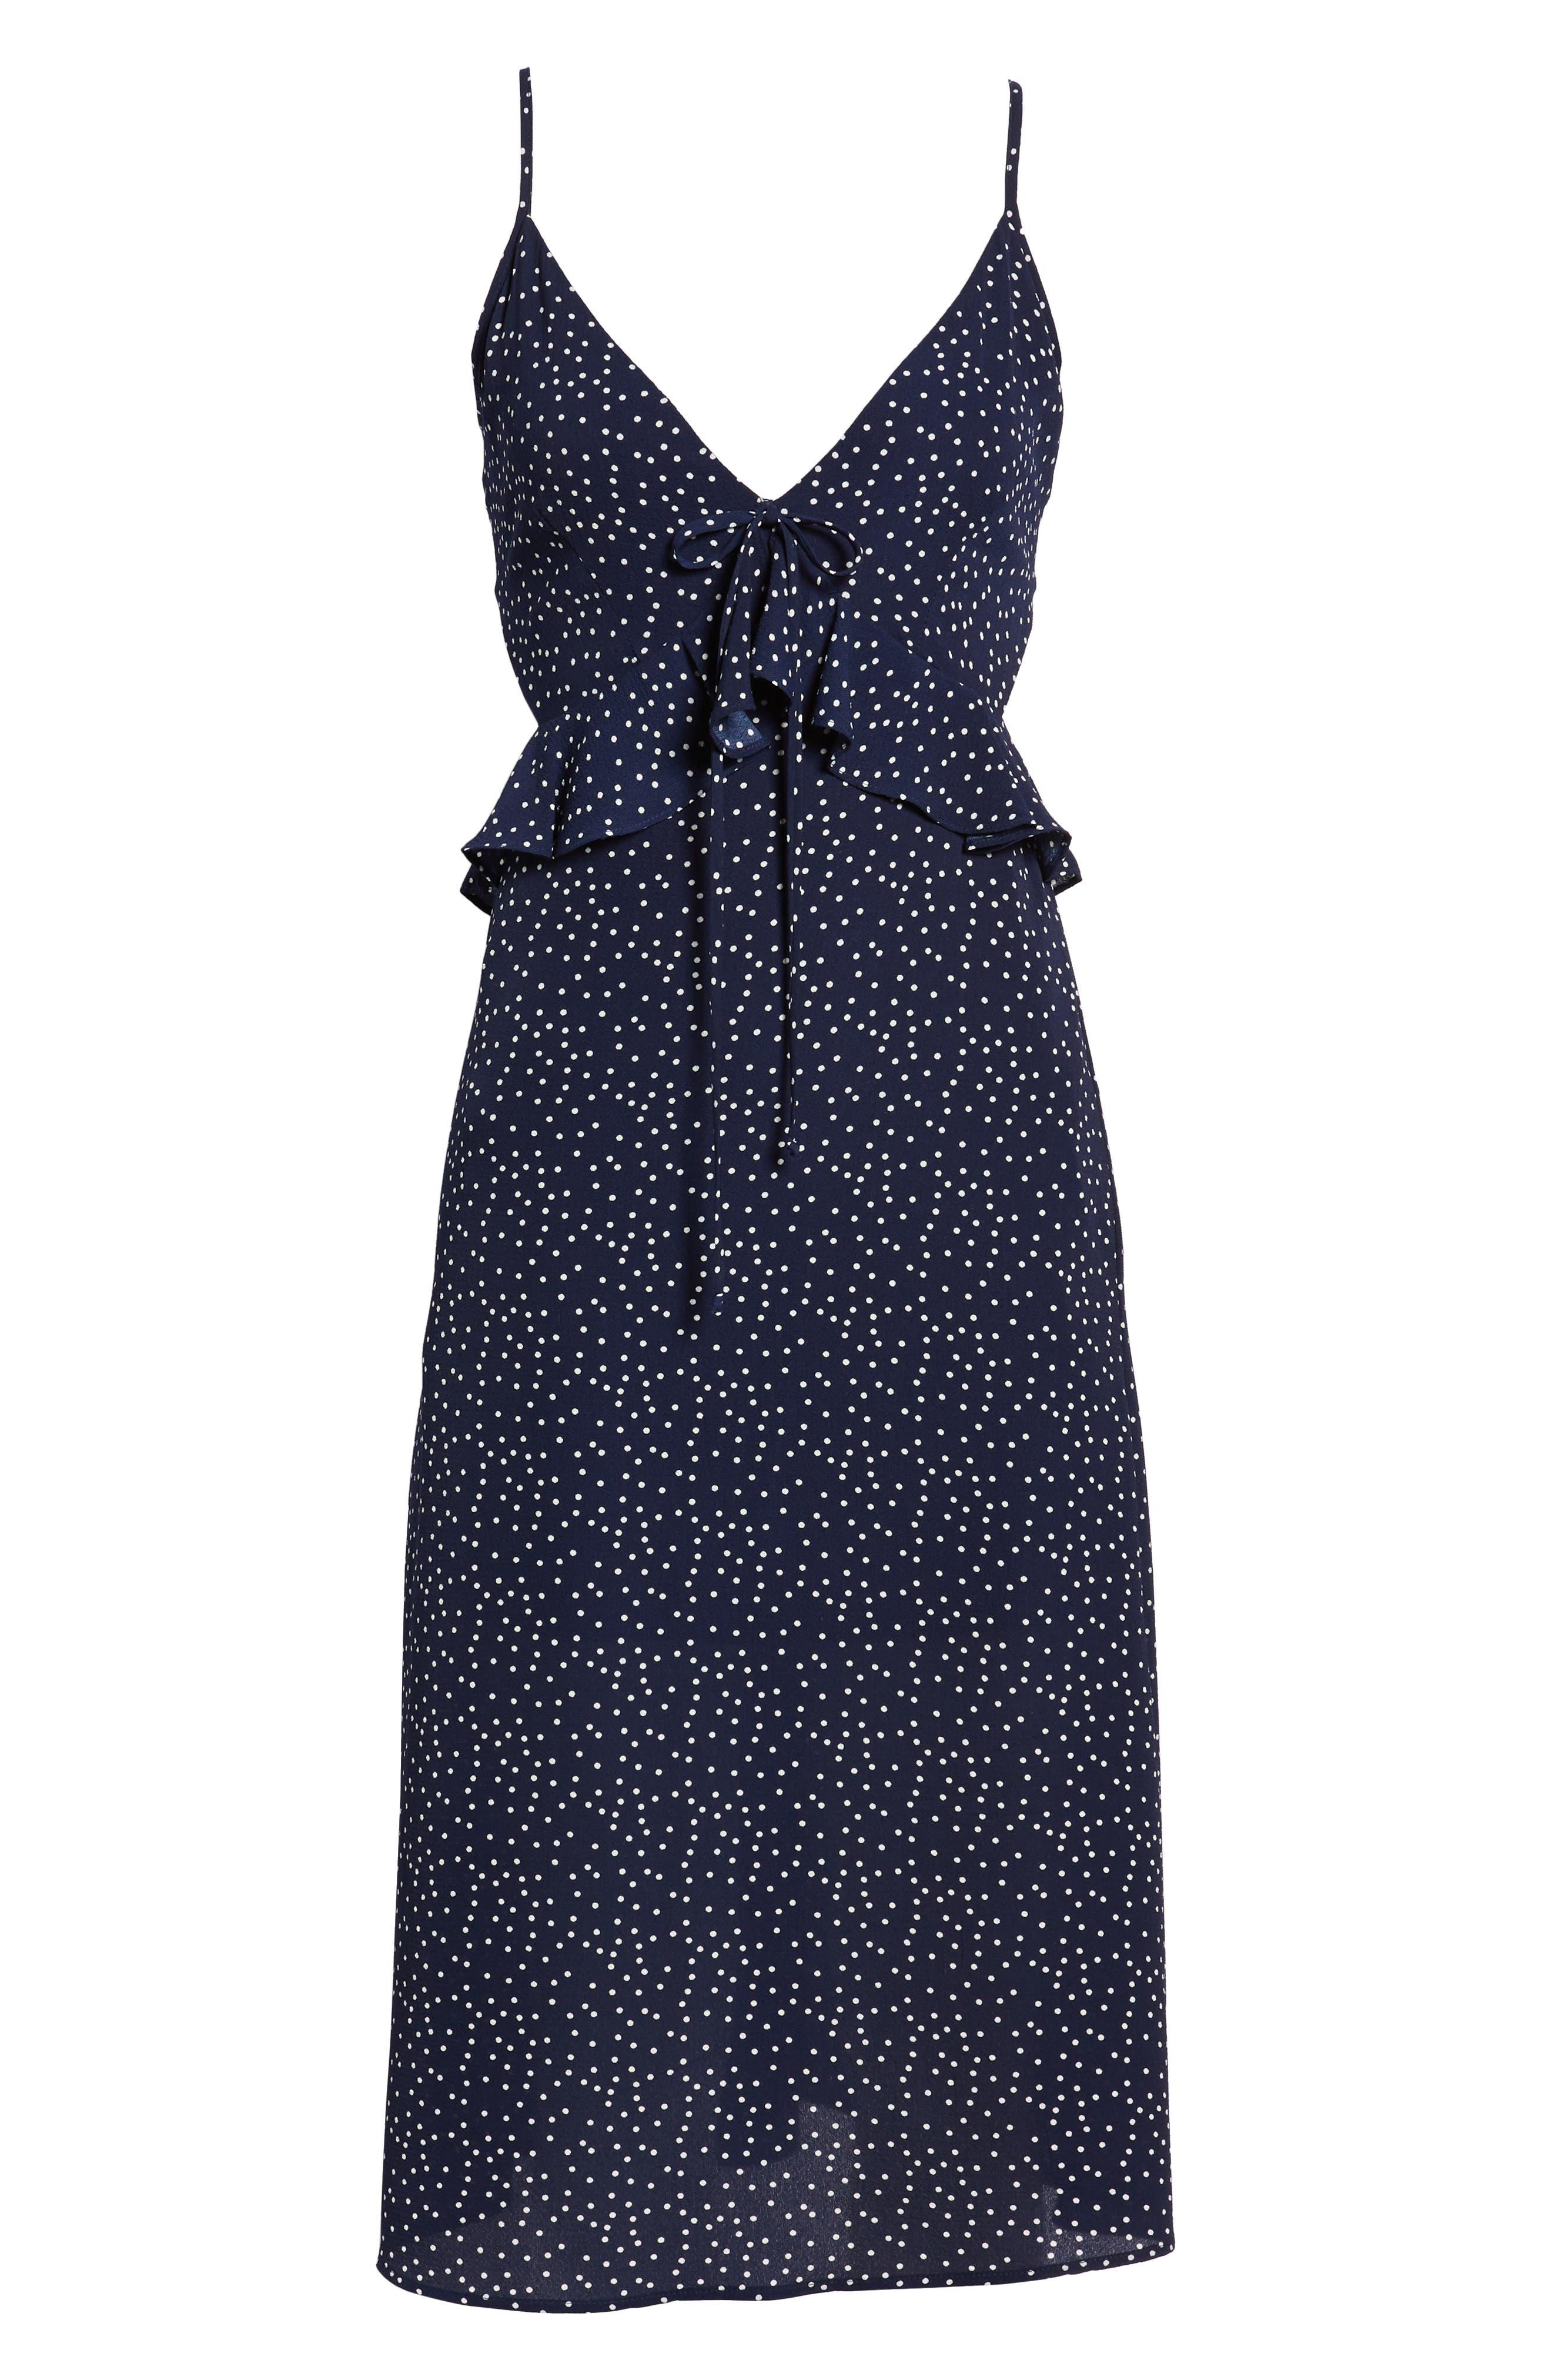 Ruffle Tie Back Midi Dress,                             Alternate thumbnail 9, color,                             Navy